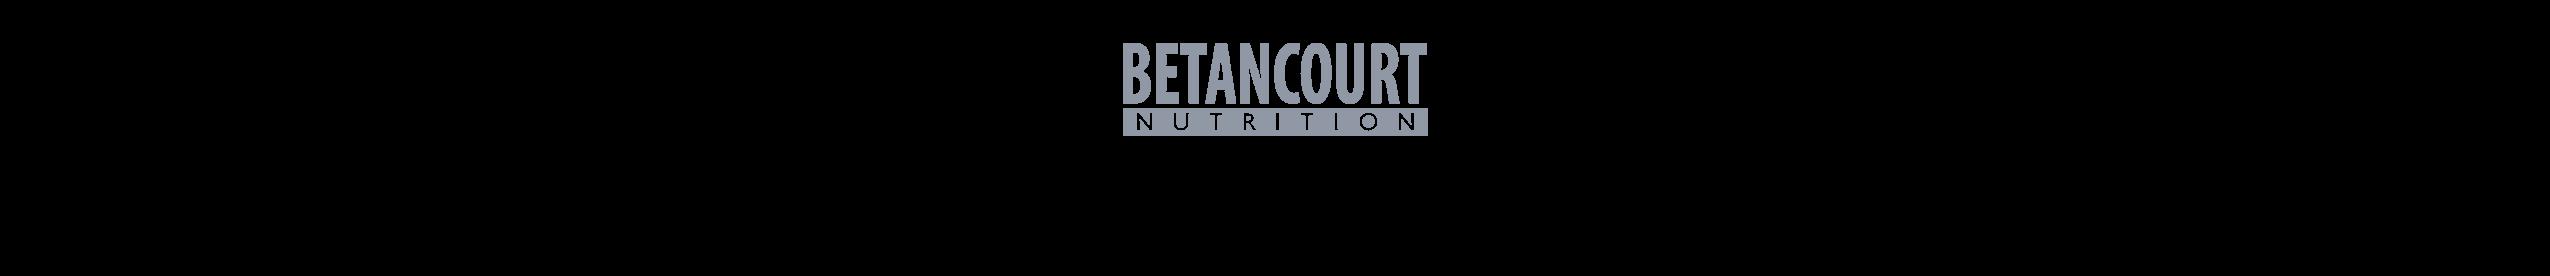 Betancourt Logo